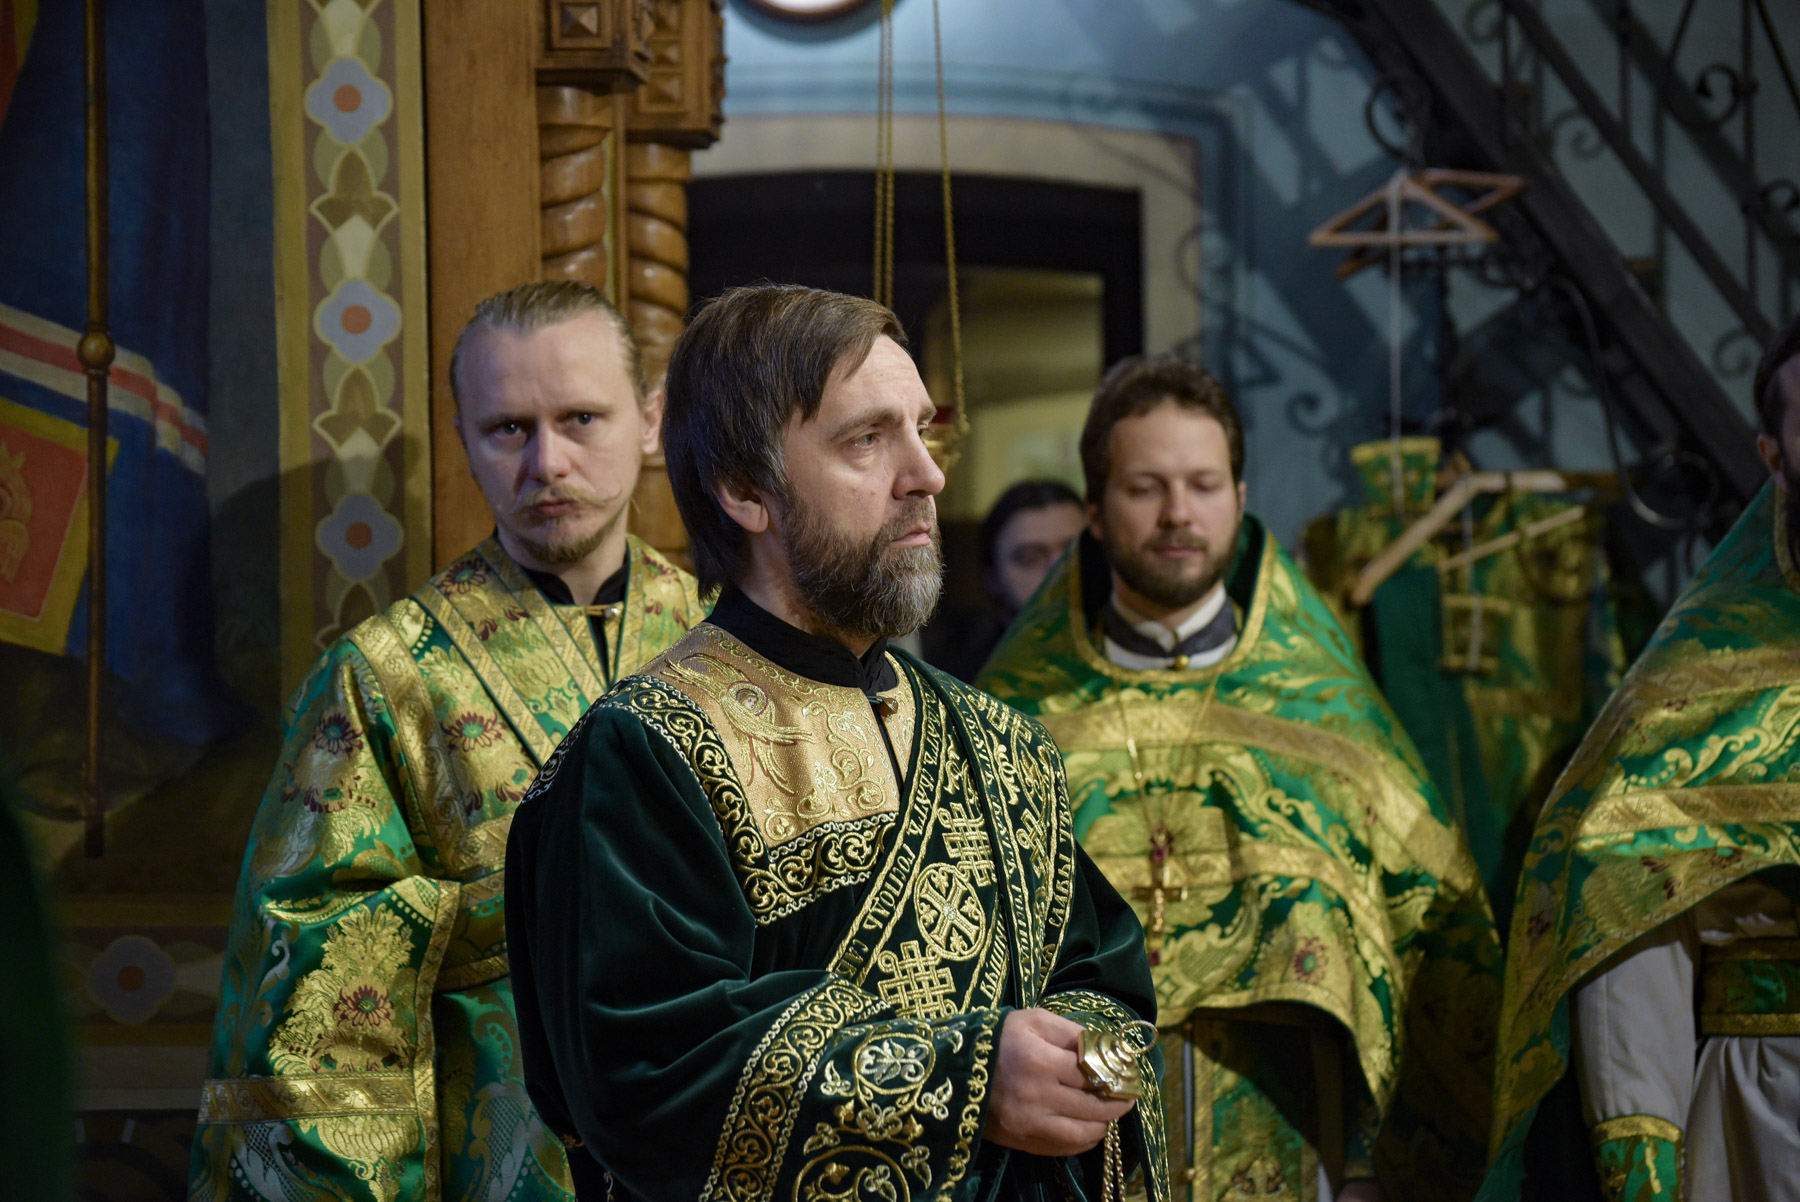 photos of orthodox christmas 0118 2